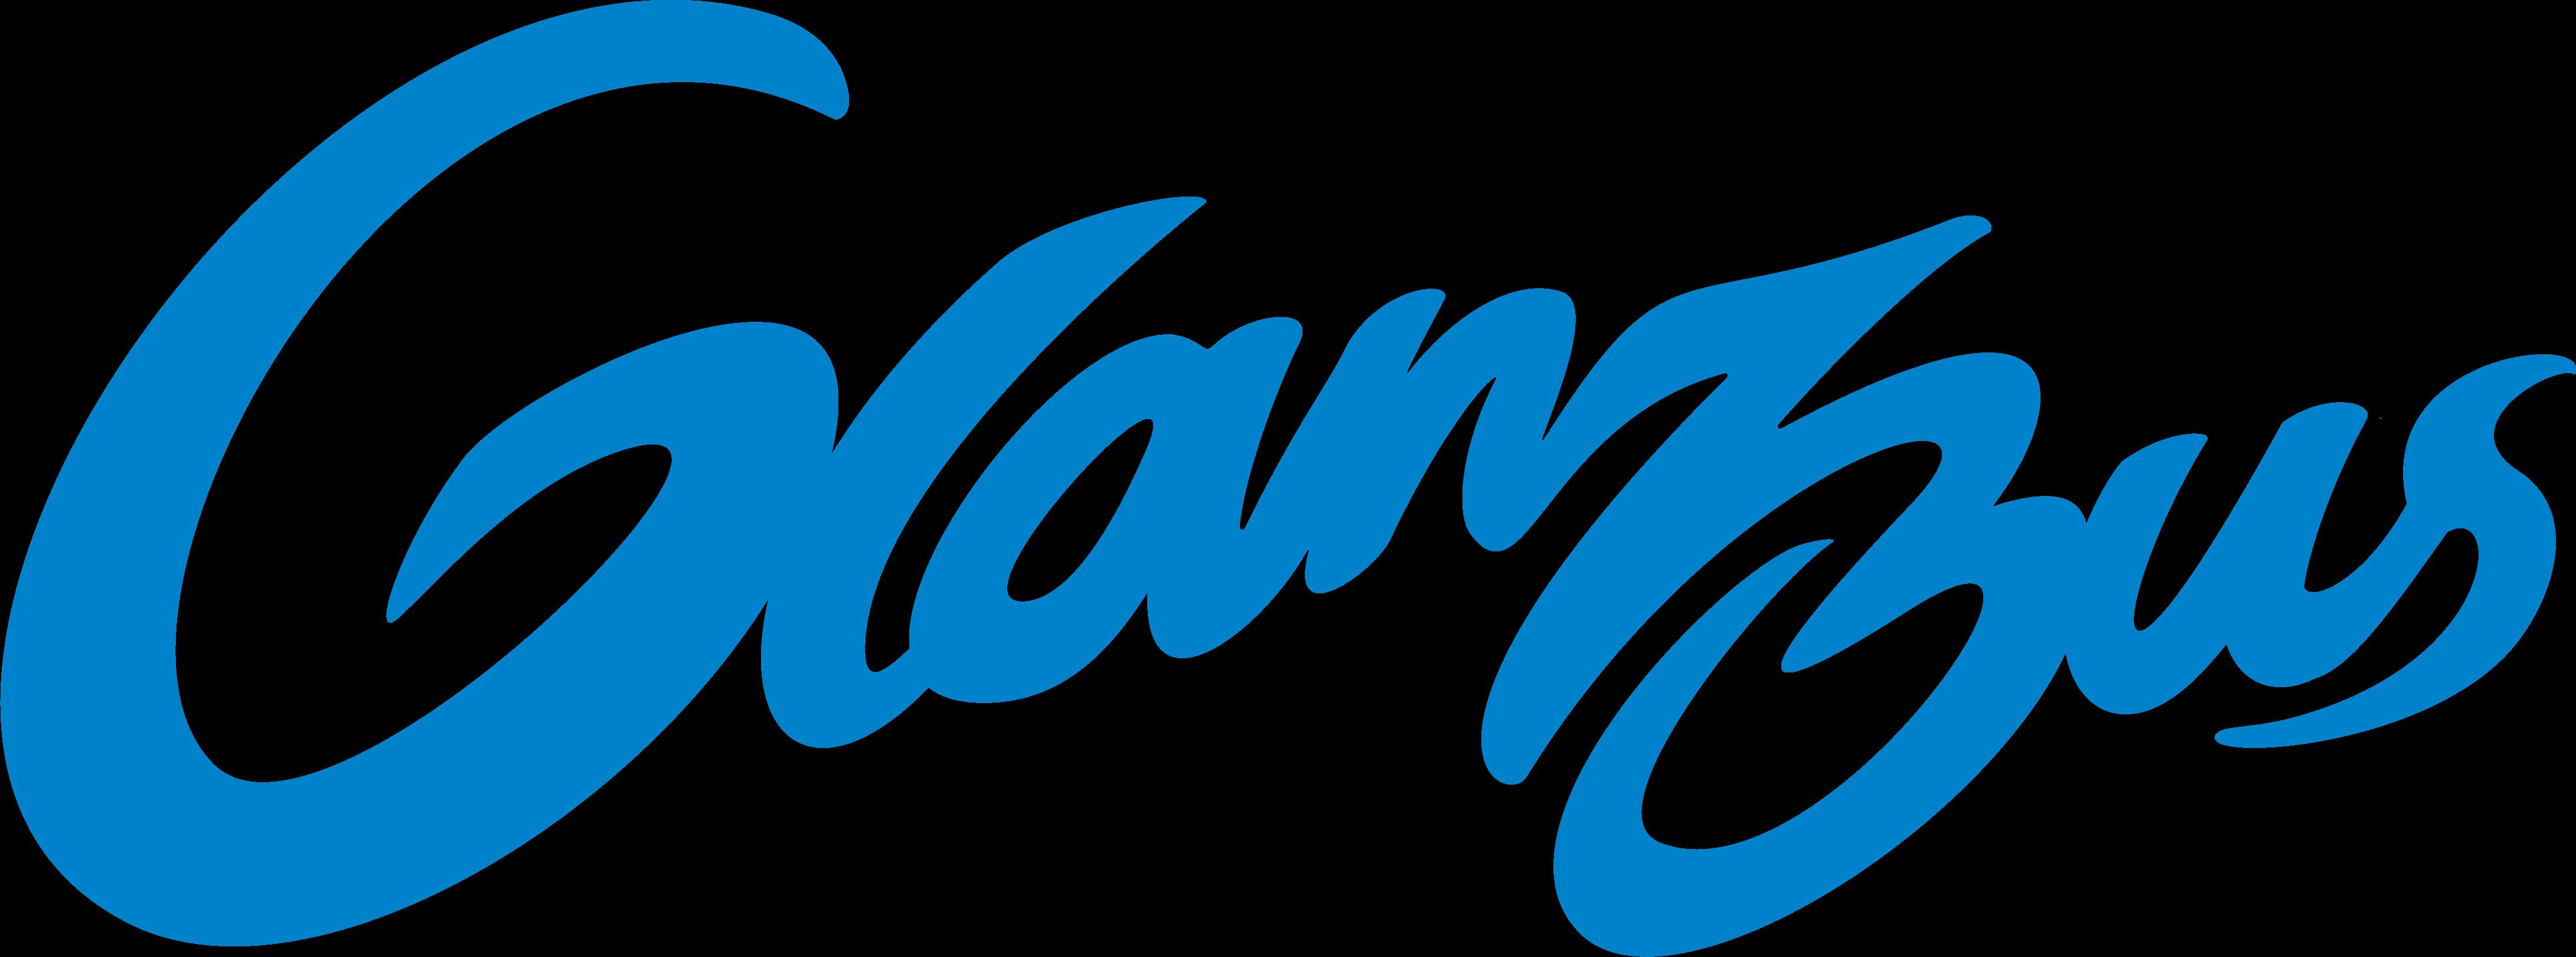 Glanzbus – Mobile Fahrzeugaufbereitung